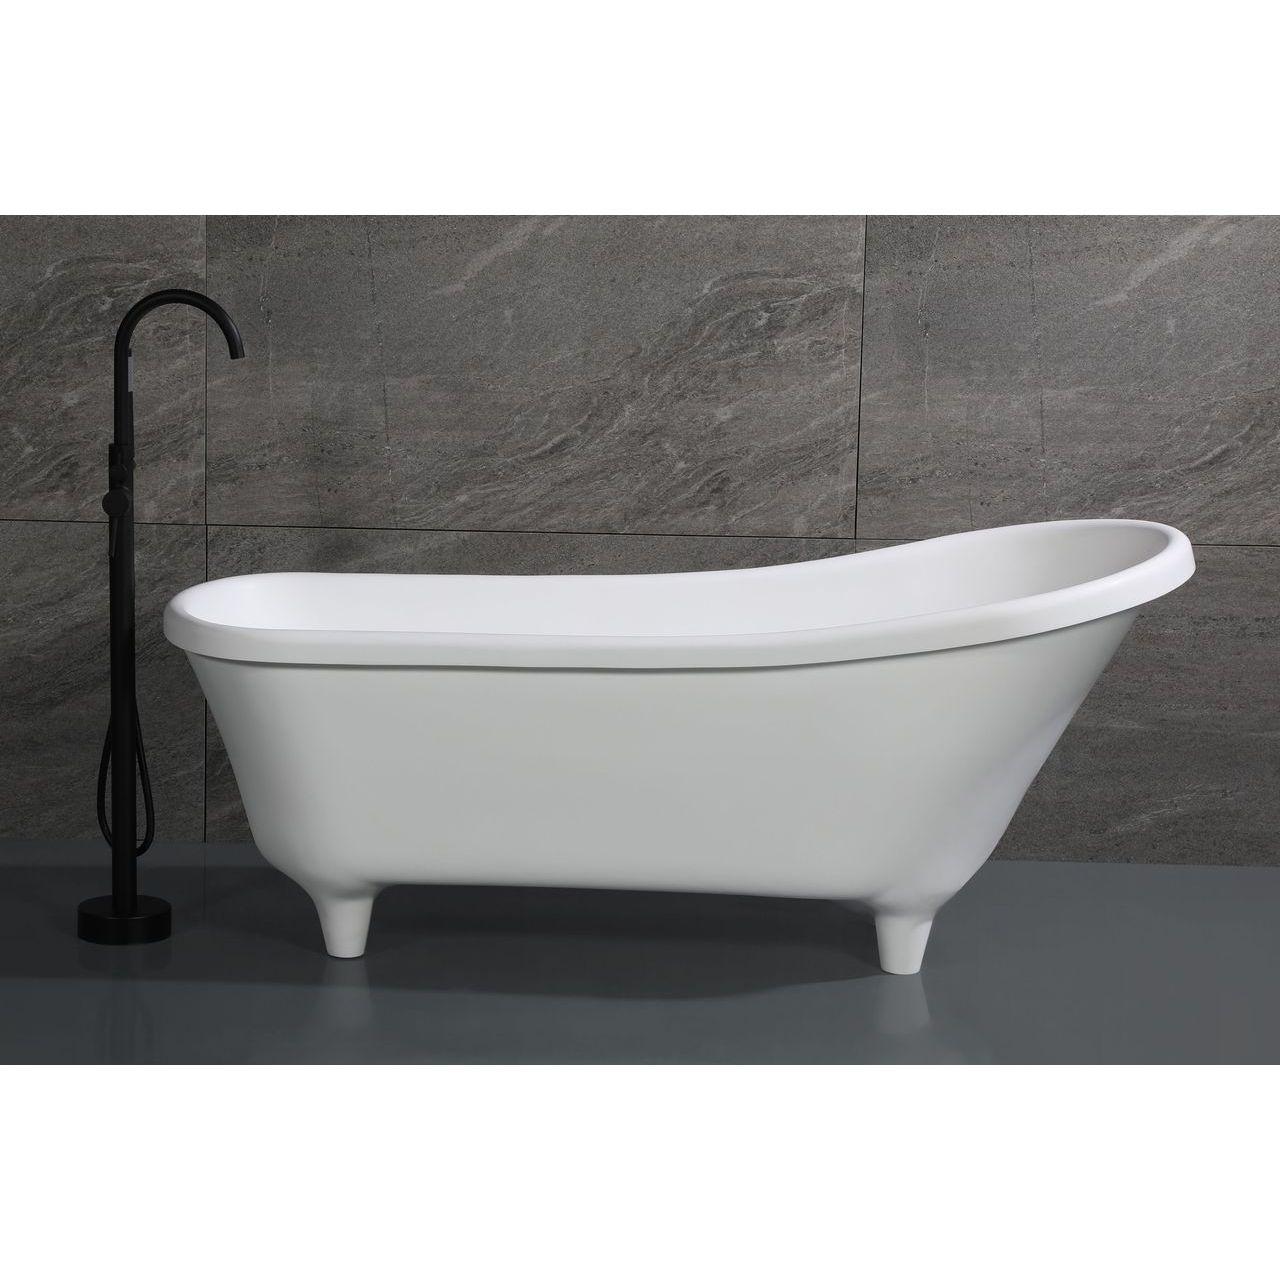 "ALFI 67"" White Matte Clawfoot Solid Surface Resin Bathtub"